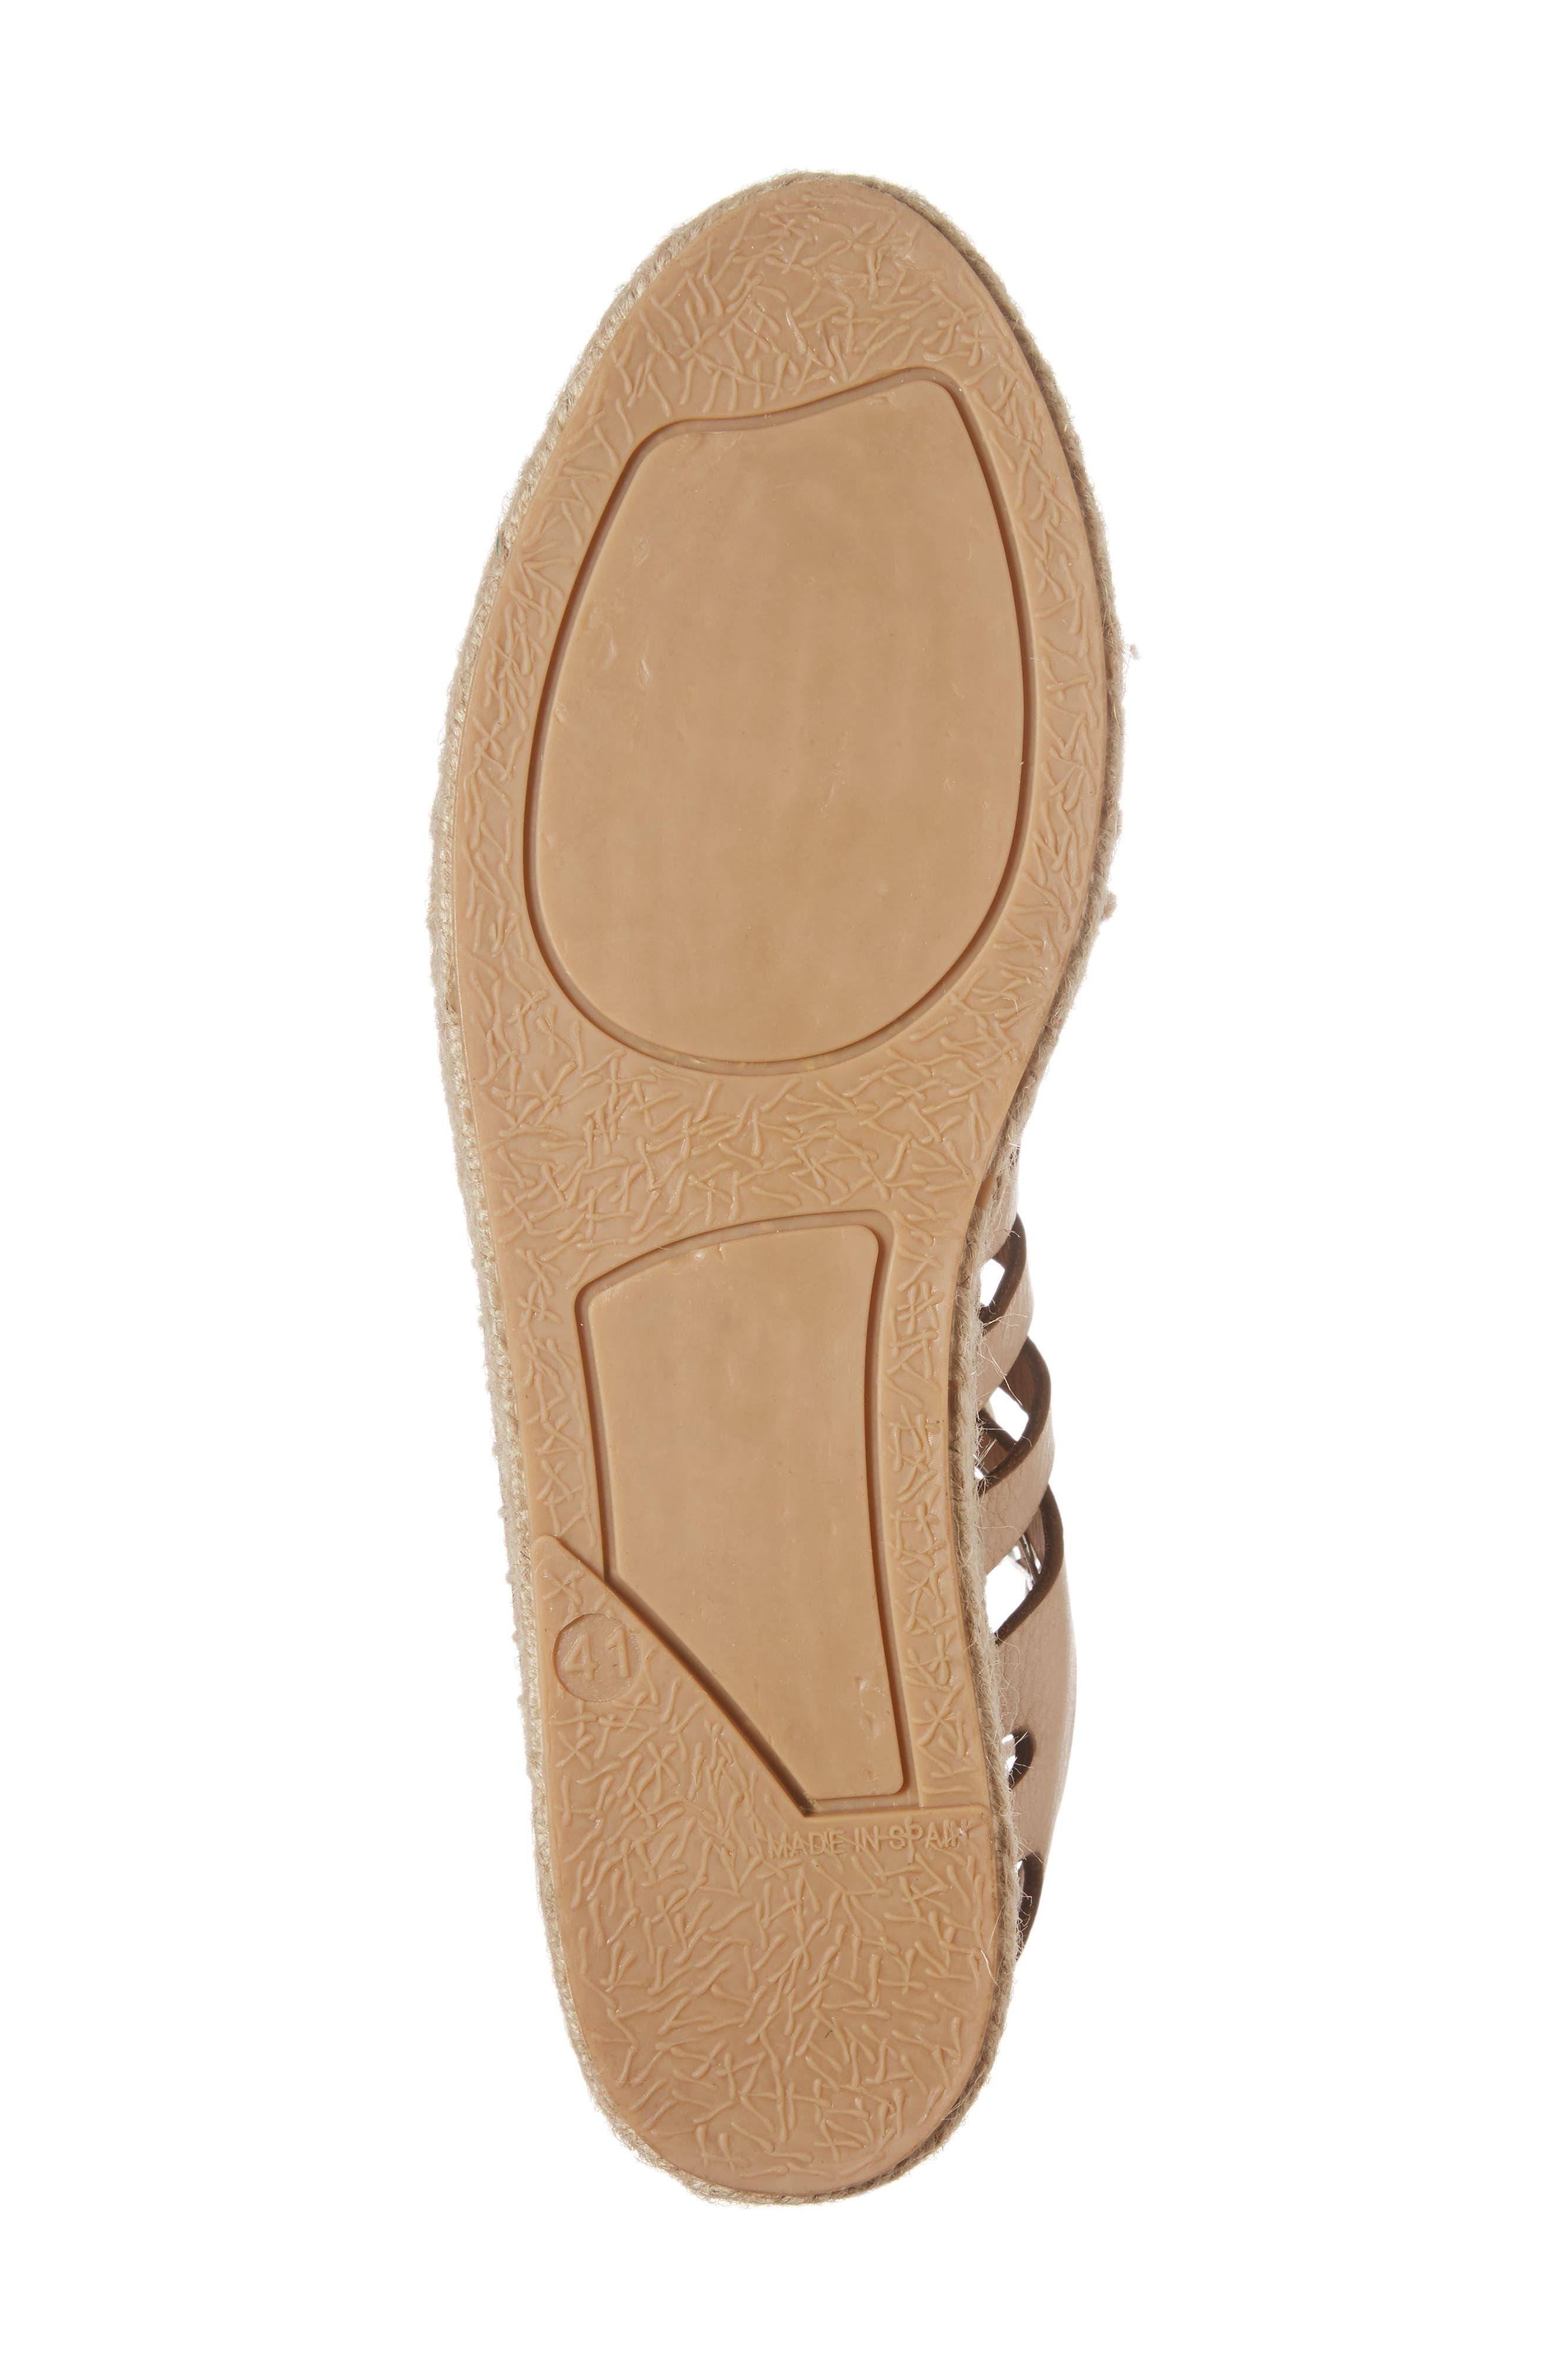 Krown Wraparound Platform Sandal,                             Alternate thumbnail 6, color,                             Nude Leather